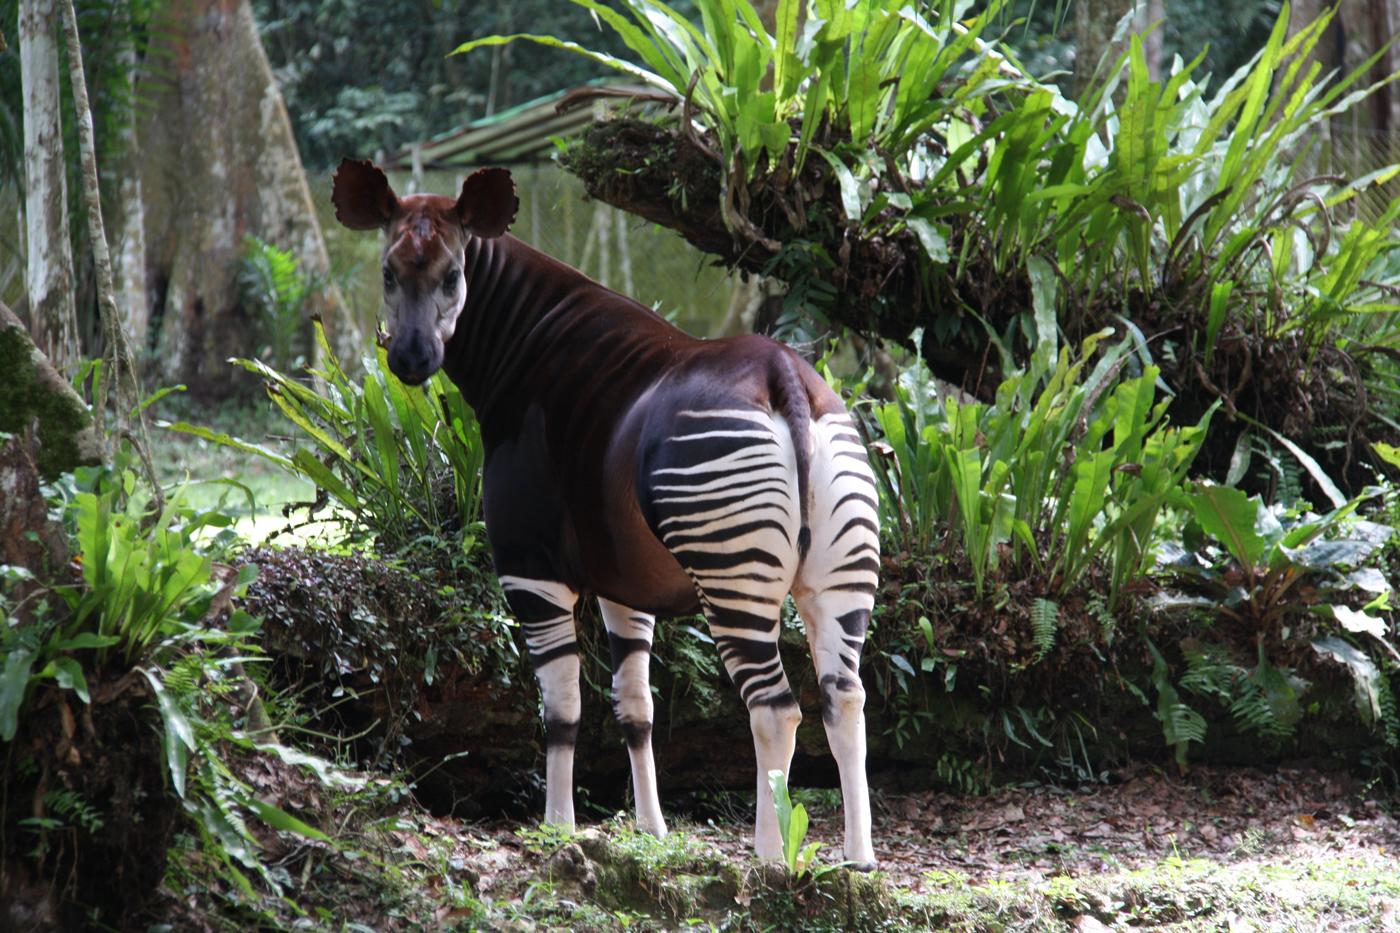 Okapi at Epulu Station in DR Congo